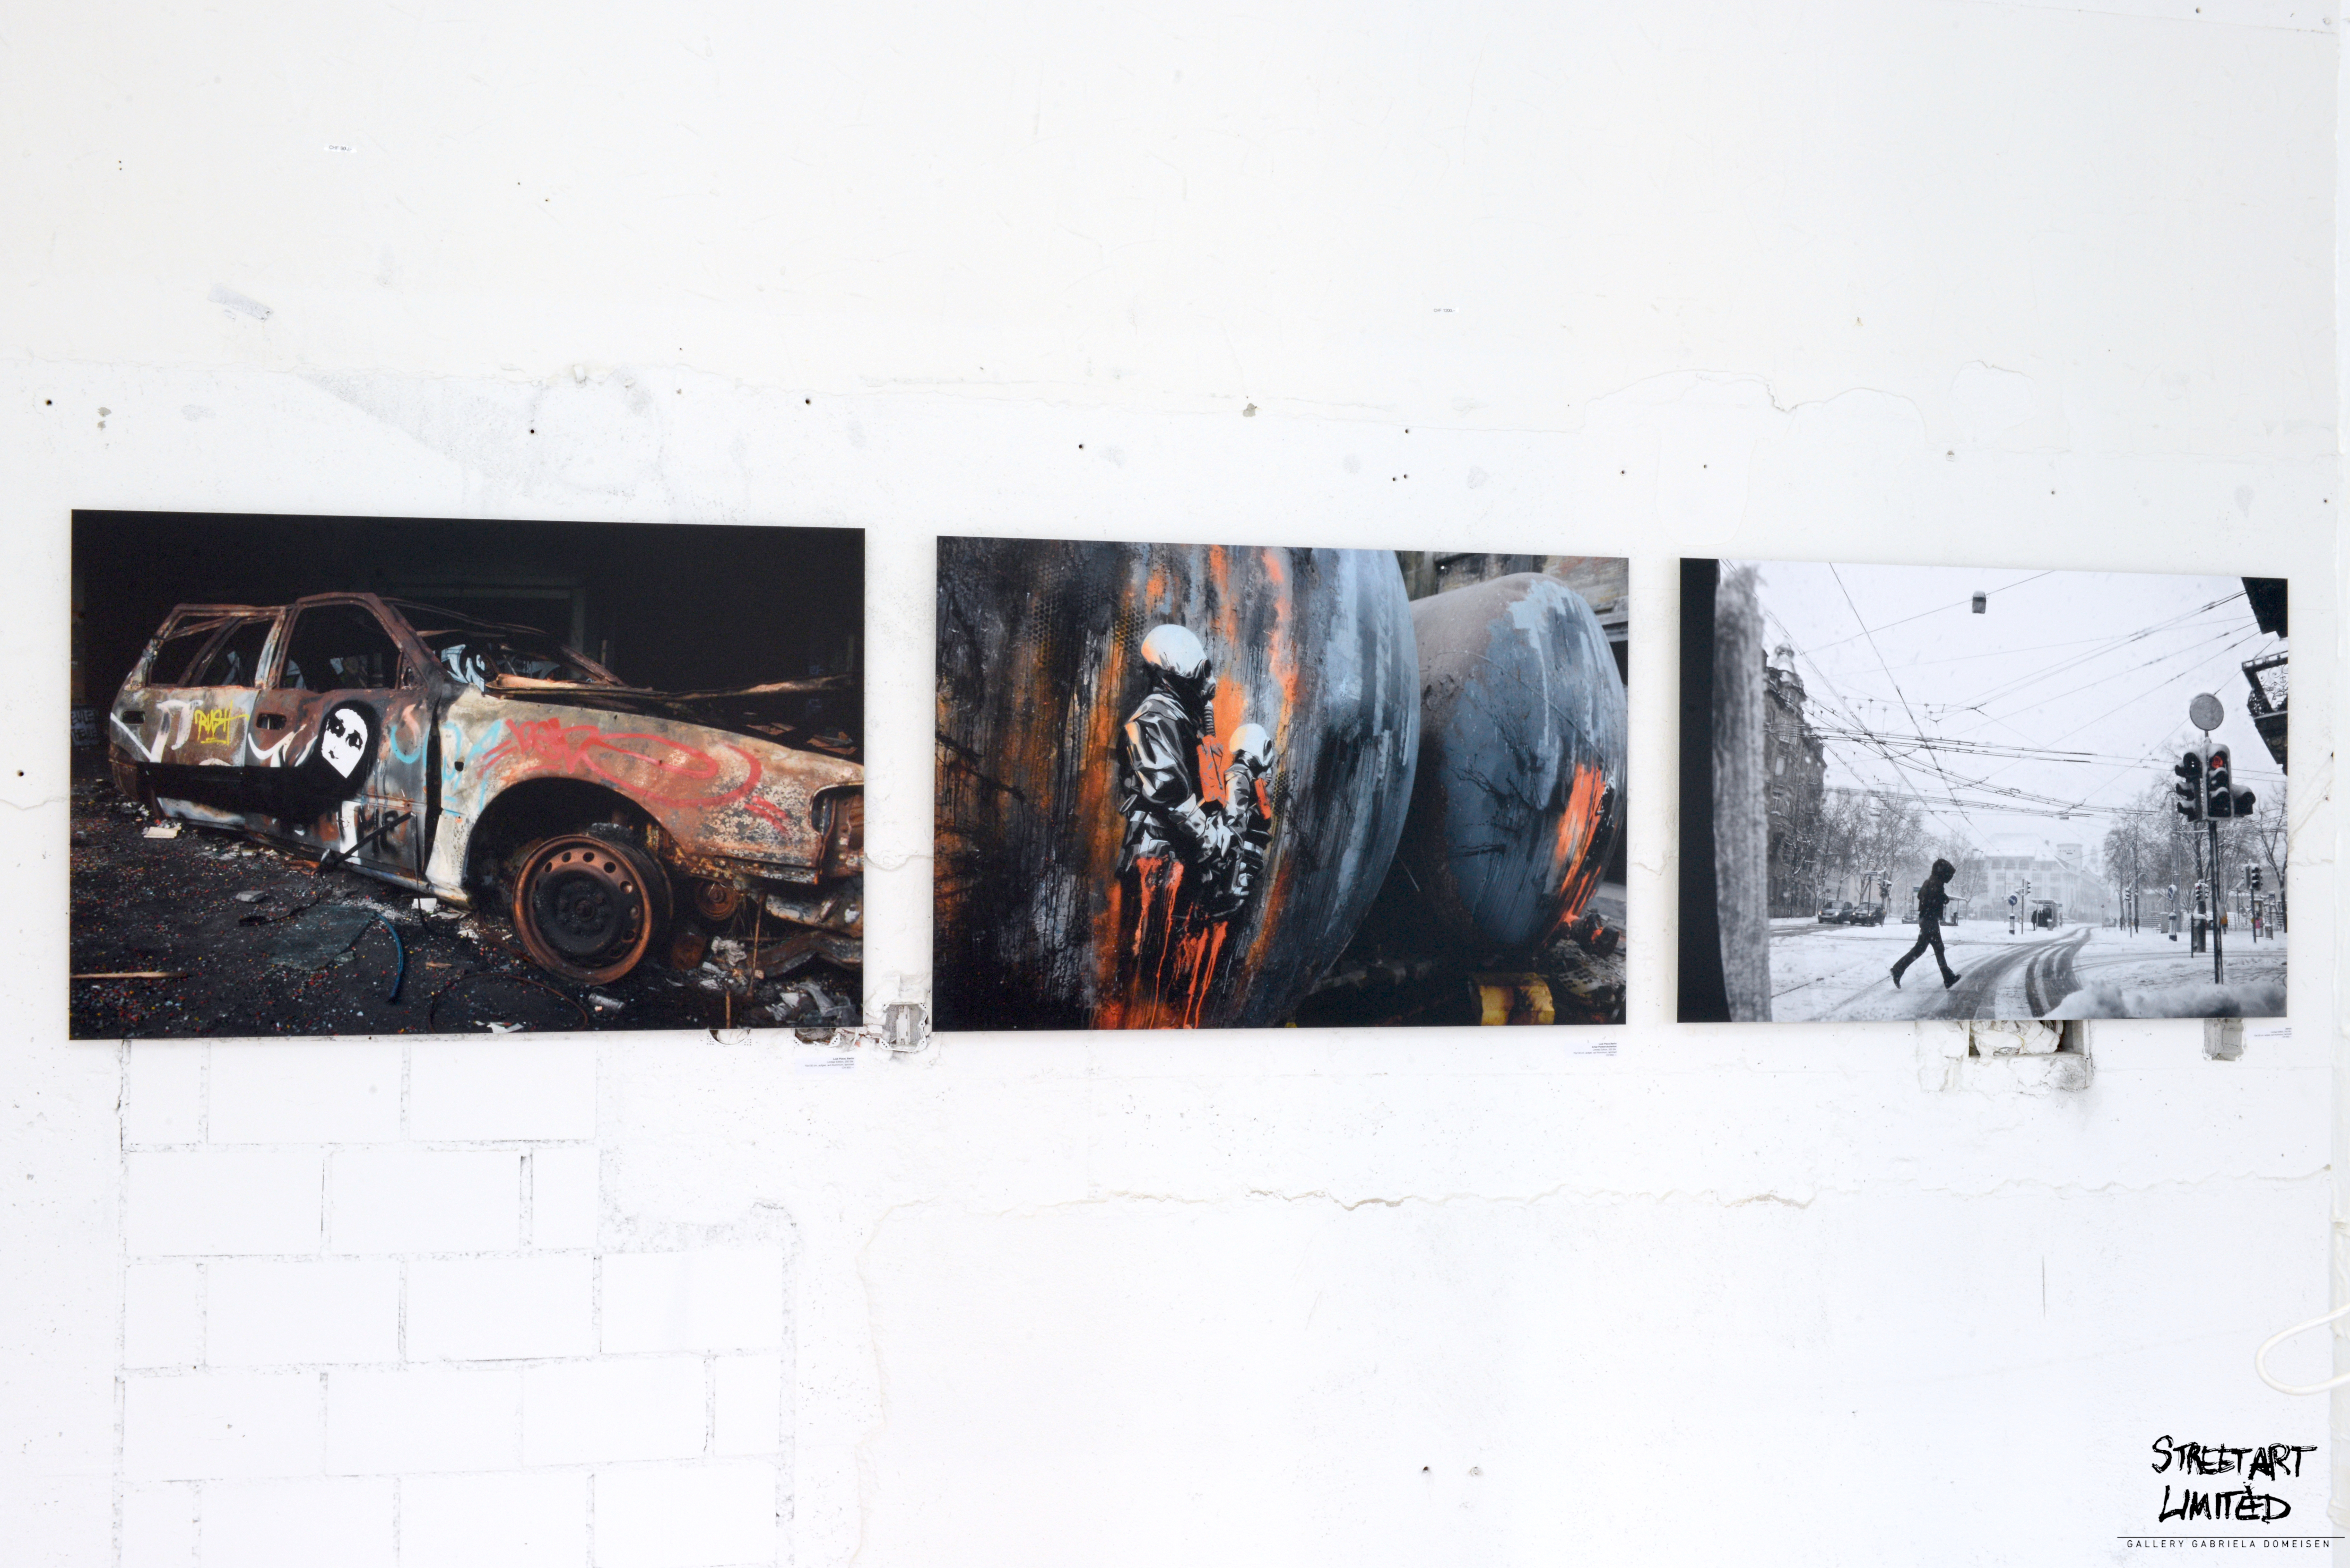 streetart.limited 2015